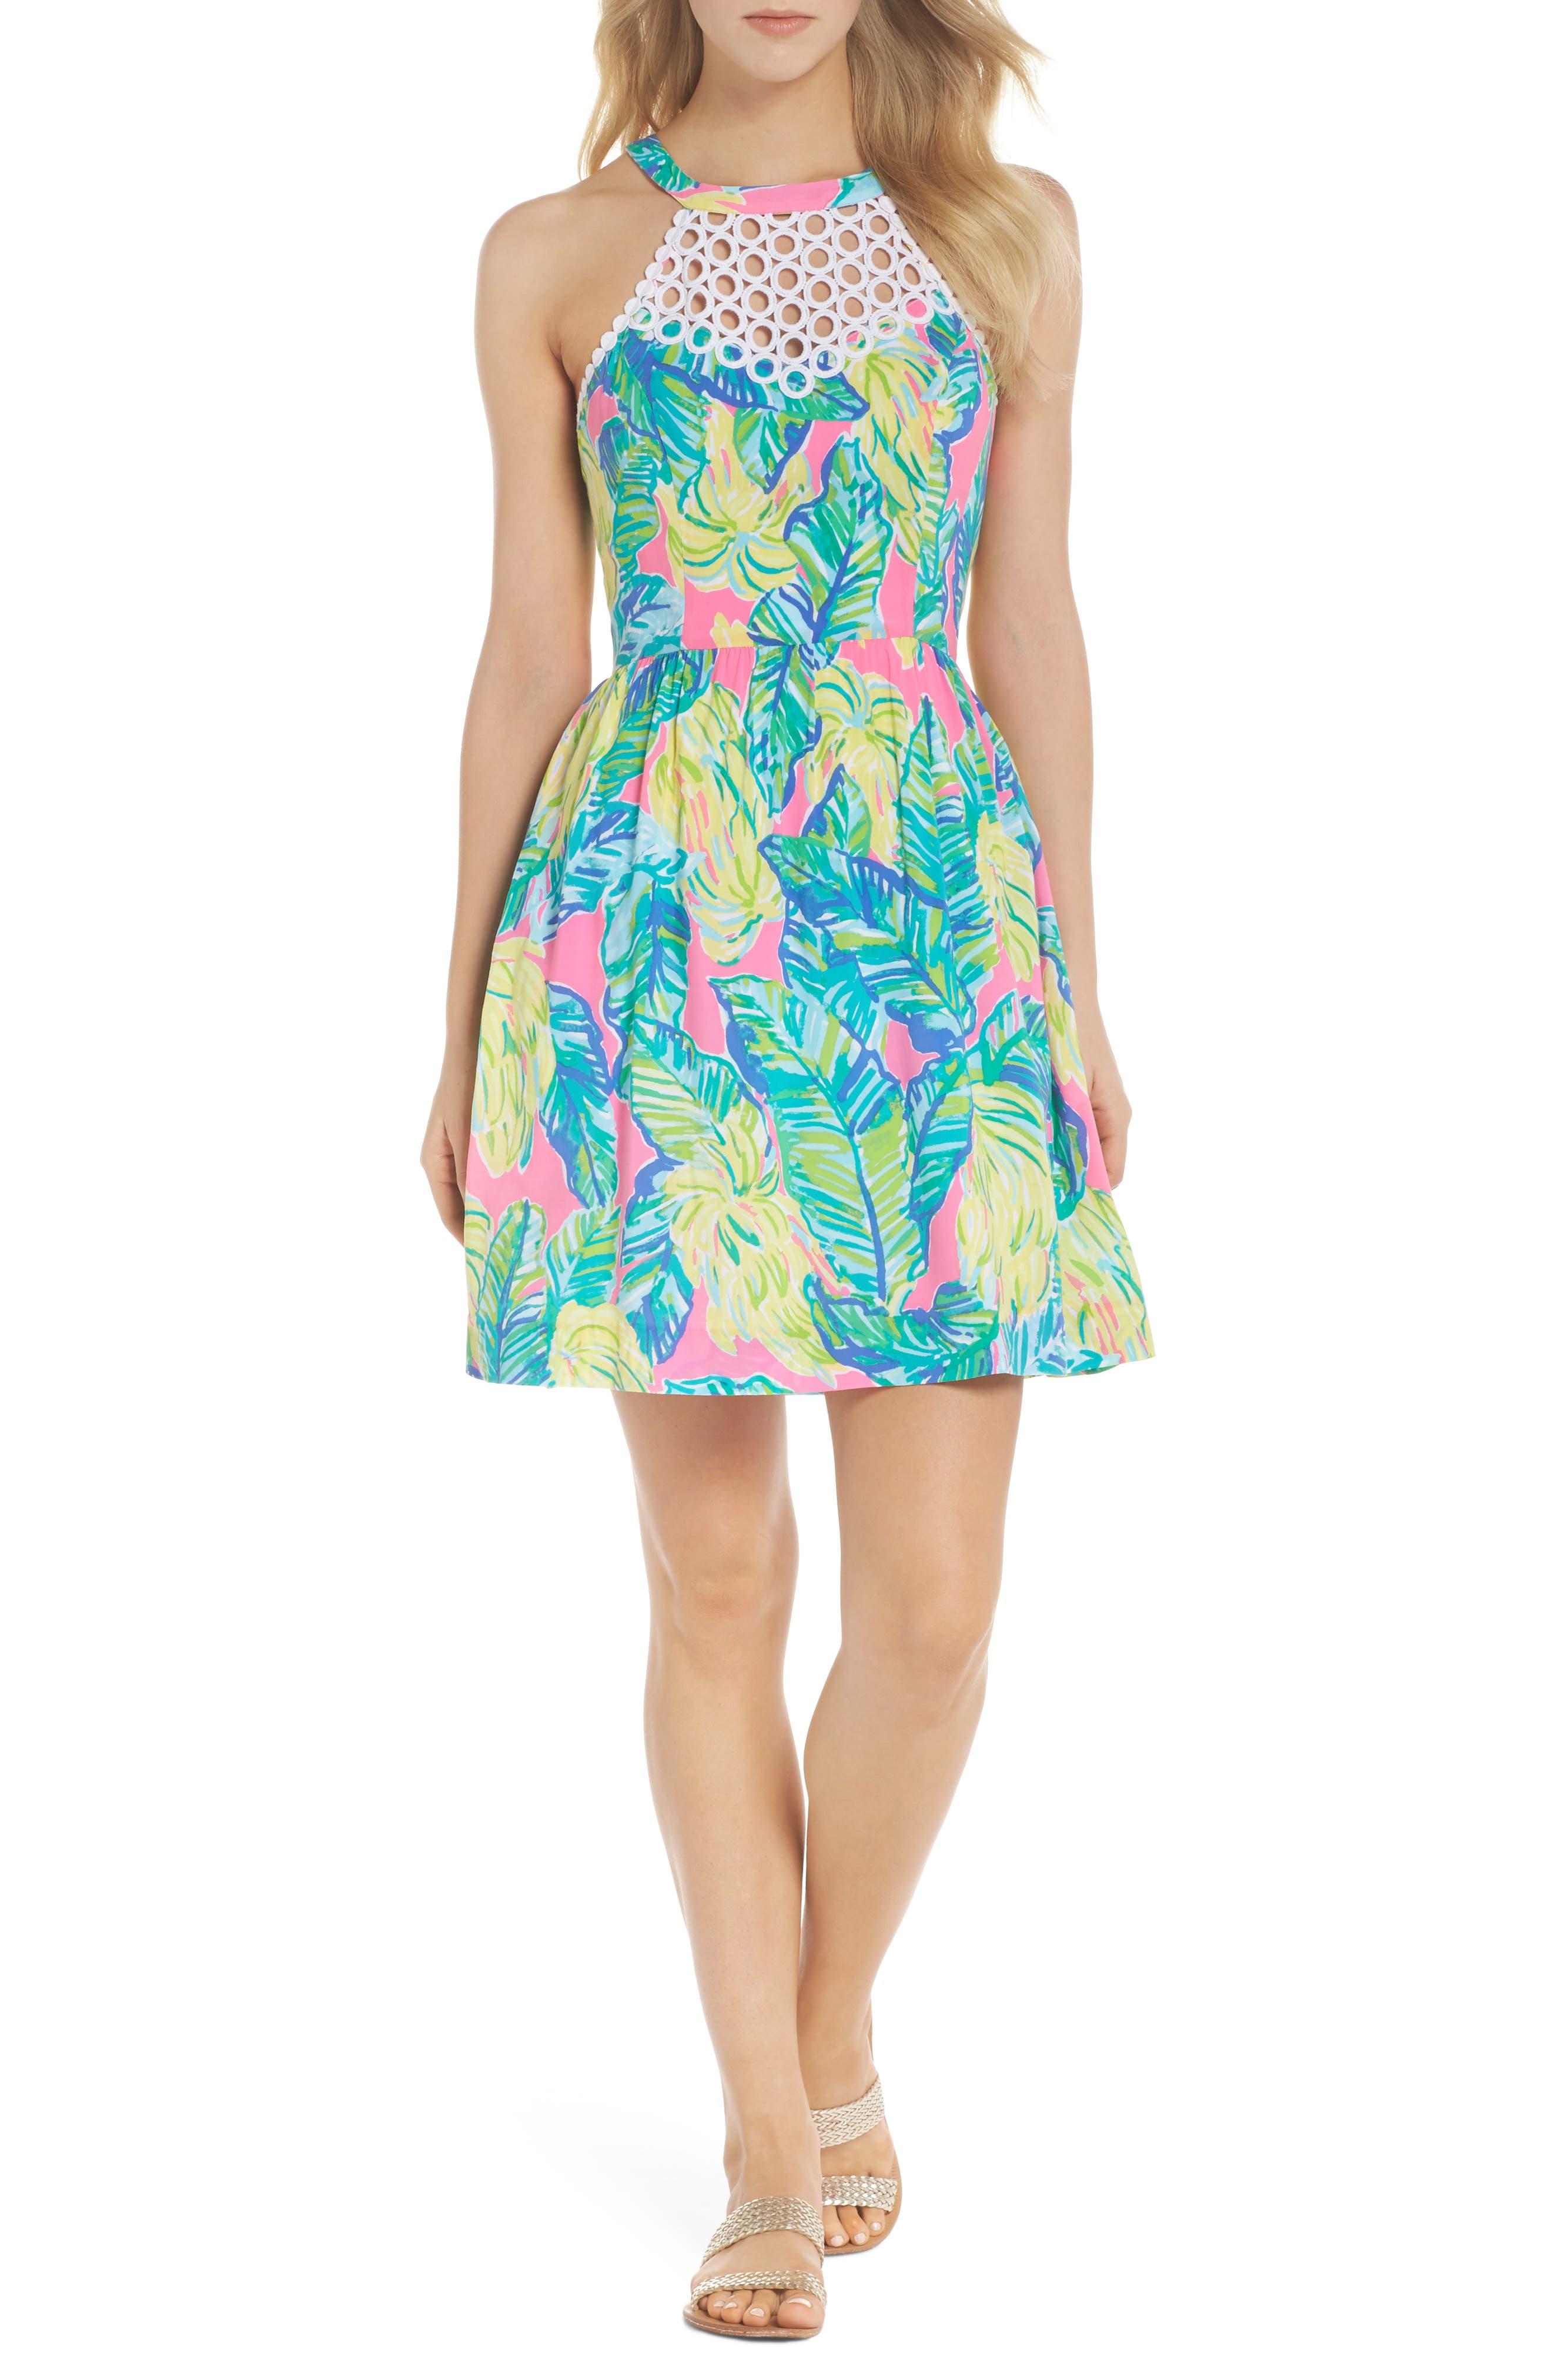 Kinley Halter Dress,                             Alternate thumbnail 5, color,                             PINK SUNSET LOCAL FLAVOR